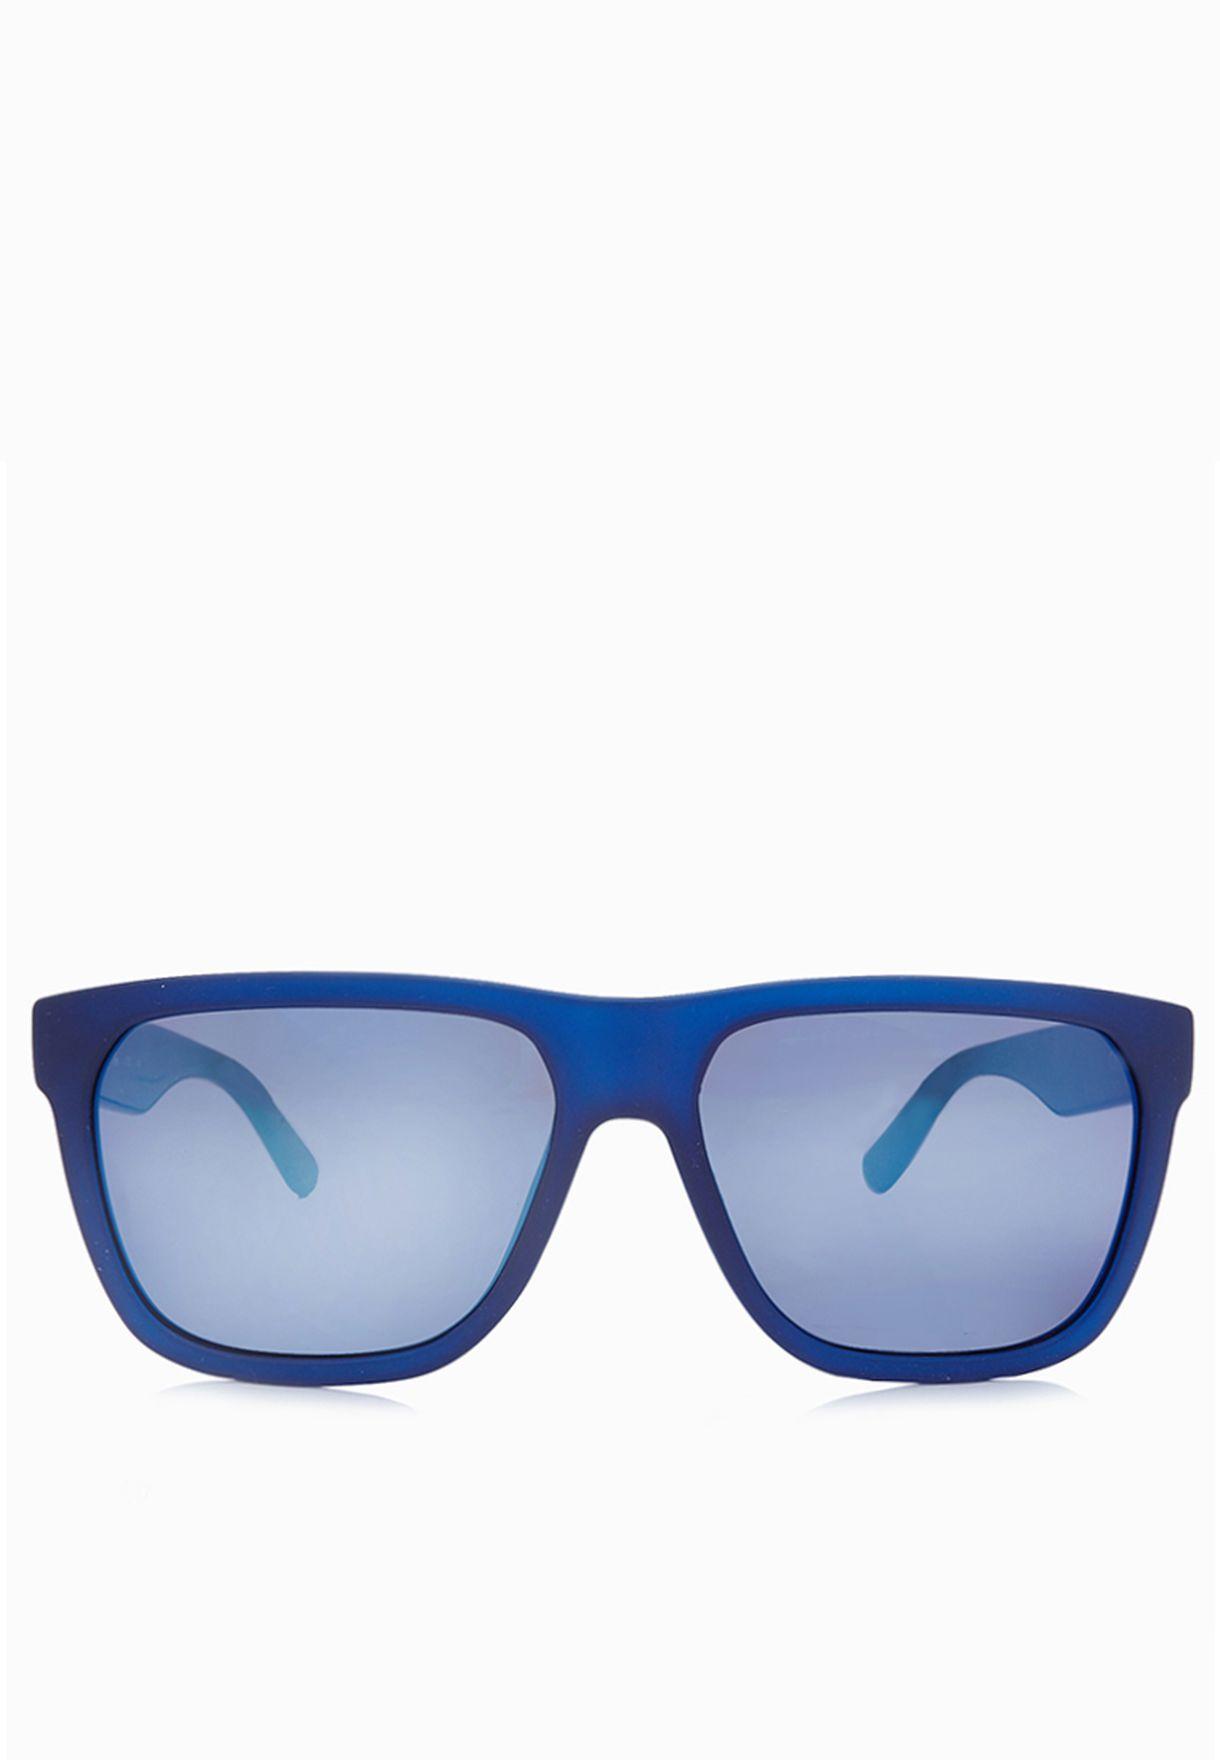 5efe187e1 تسوق نظارة شسية واي فيرر ماركة لاكوست لون أزرق L732S-424 في السعودية ...